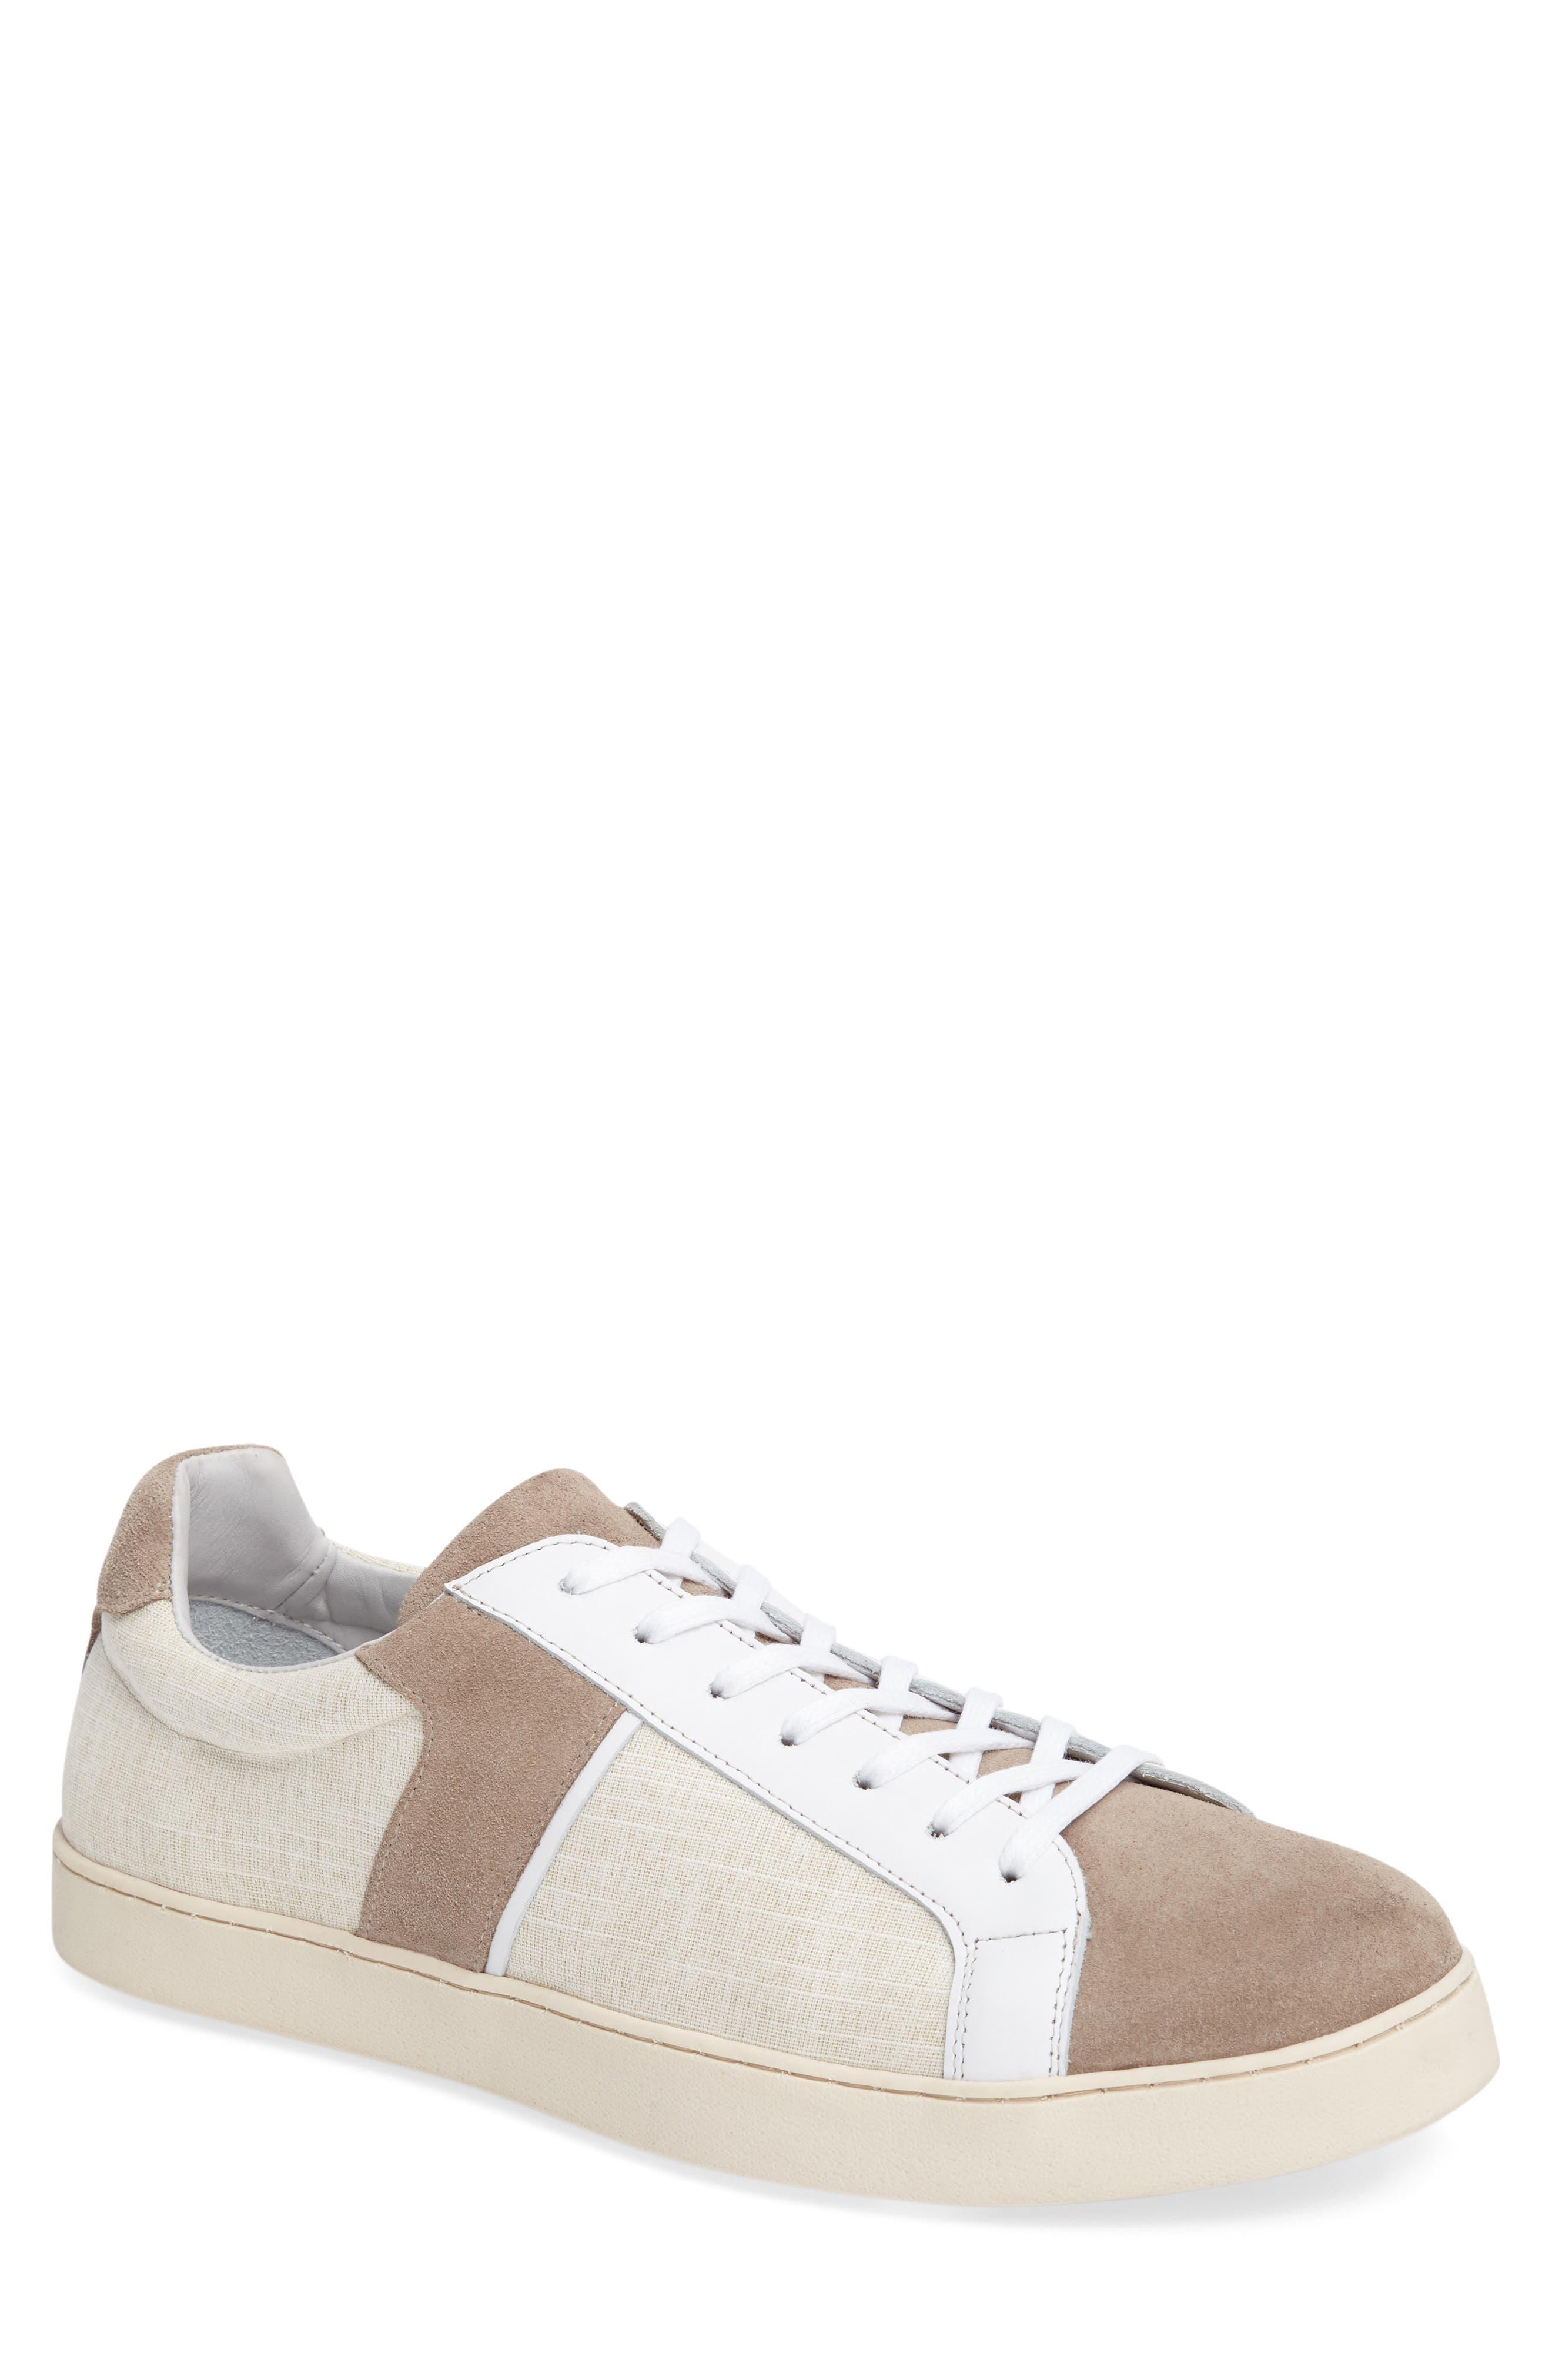 Ginx Sneaker,                         Main,                         color, 260